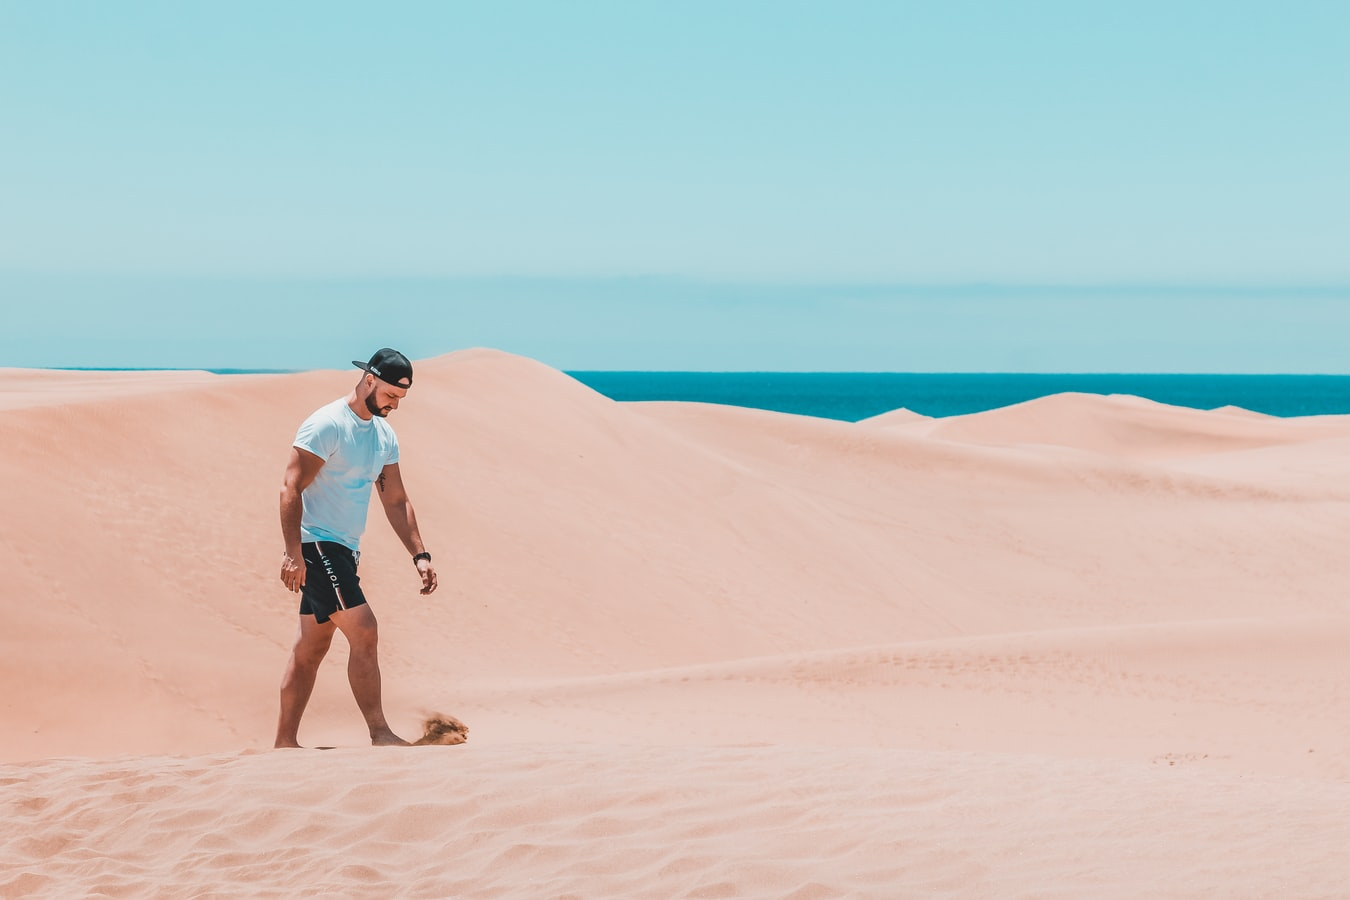 La playa de Maspalomas, nel sud di Gran Canaria